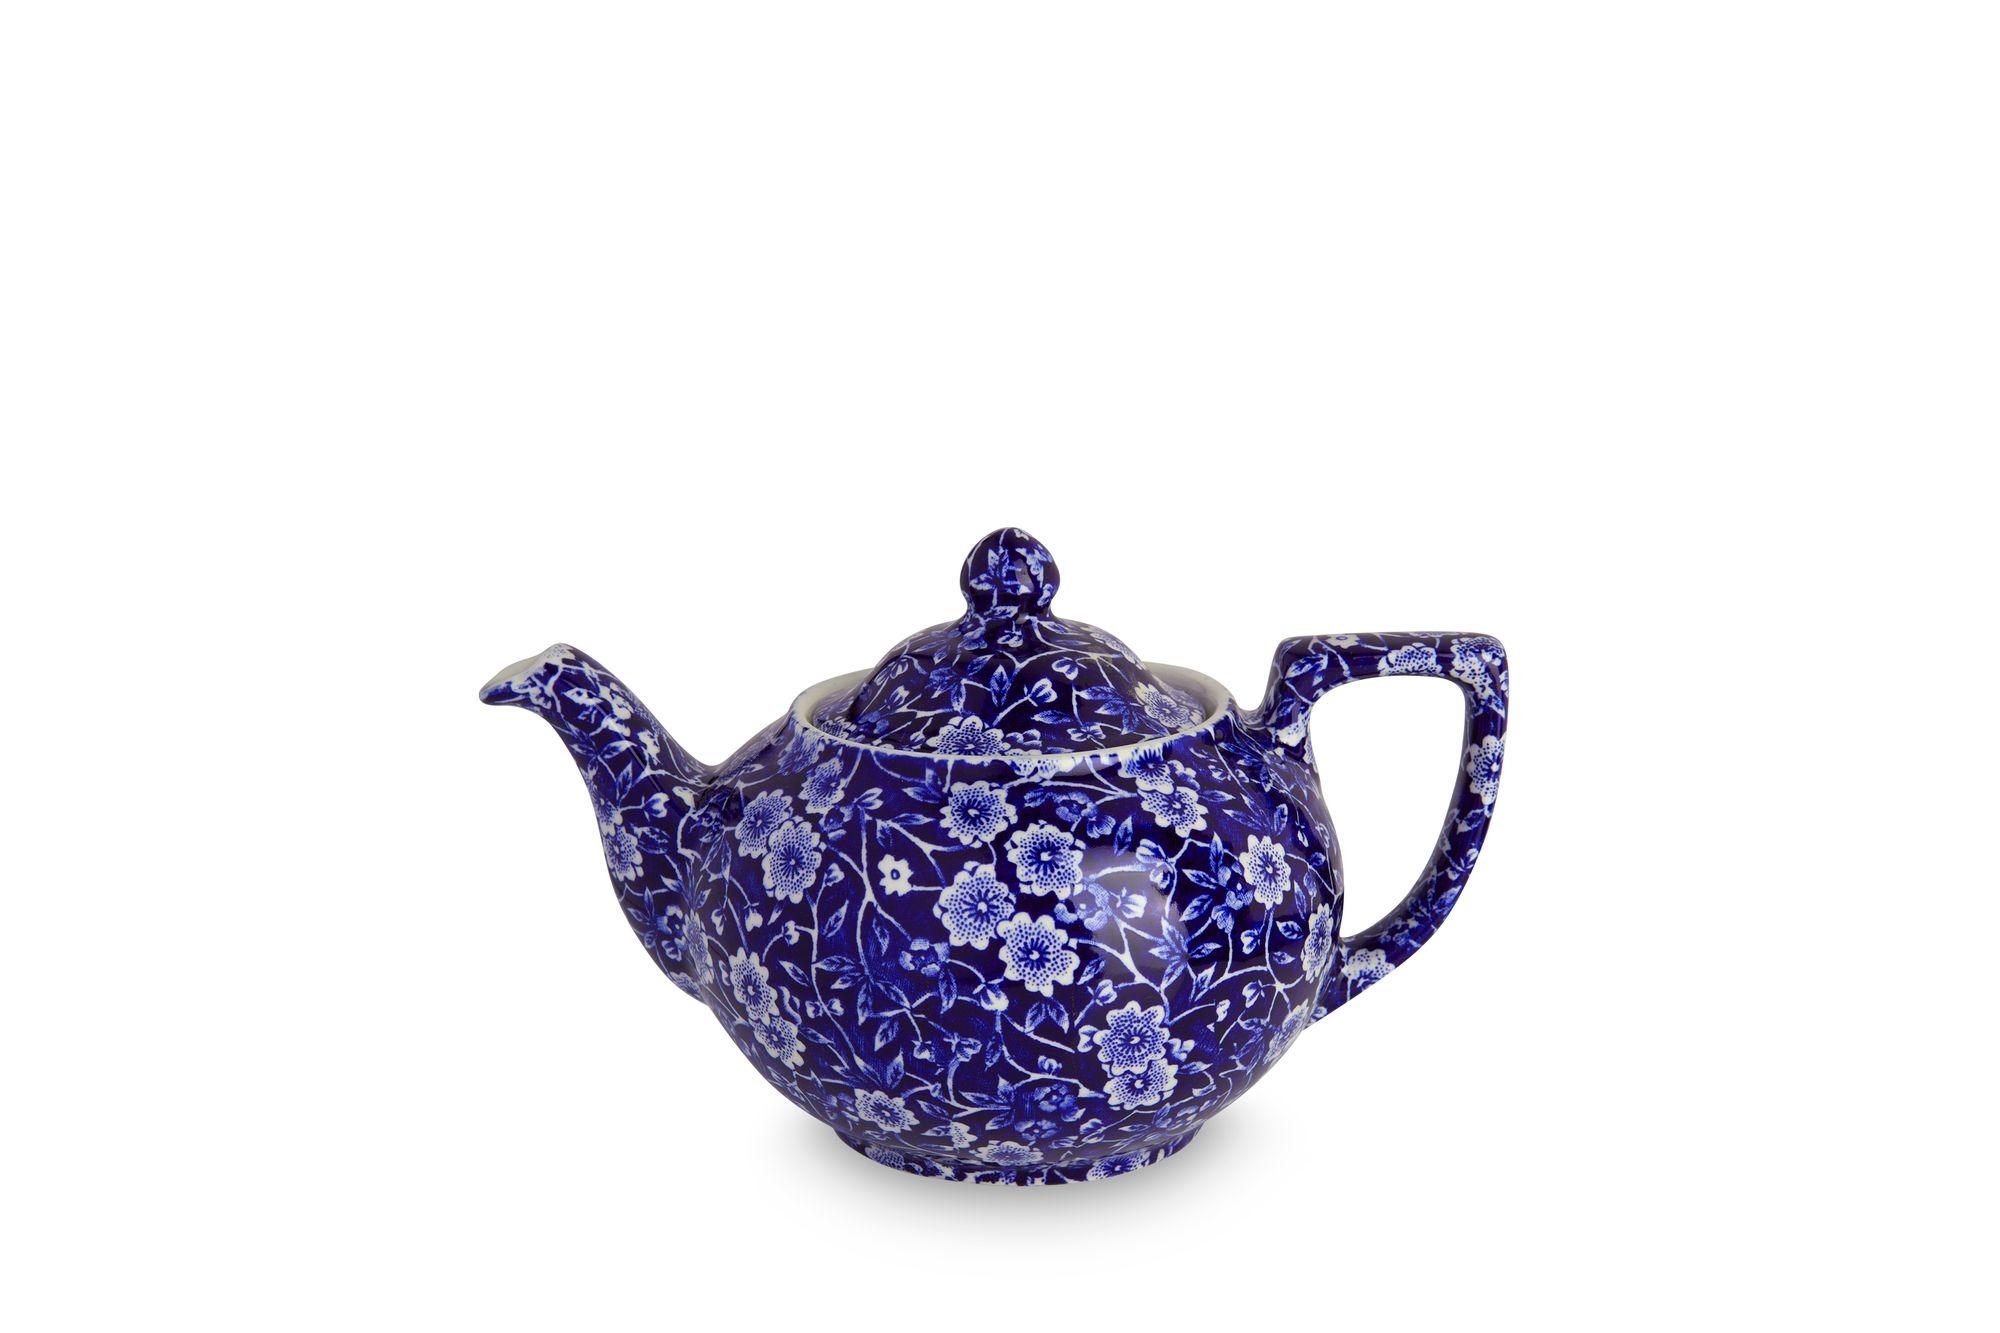 Burleigh Blue Calico Teapot 1pt thumb 1